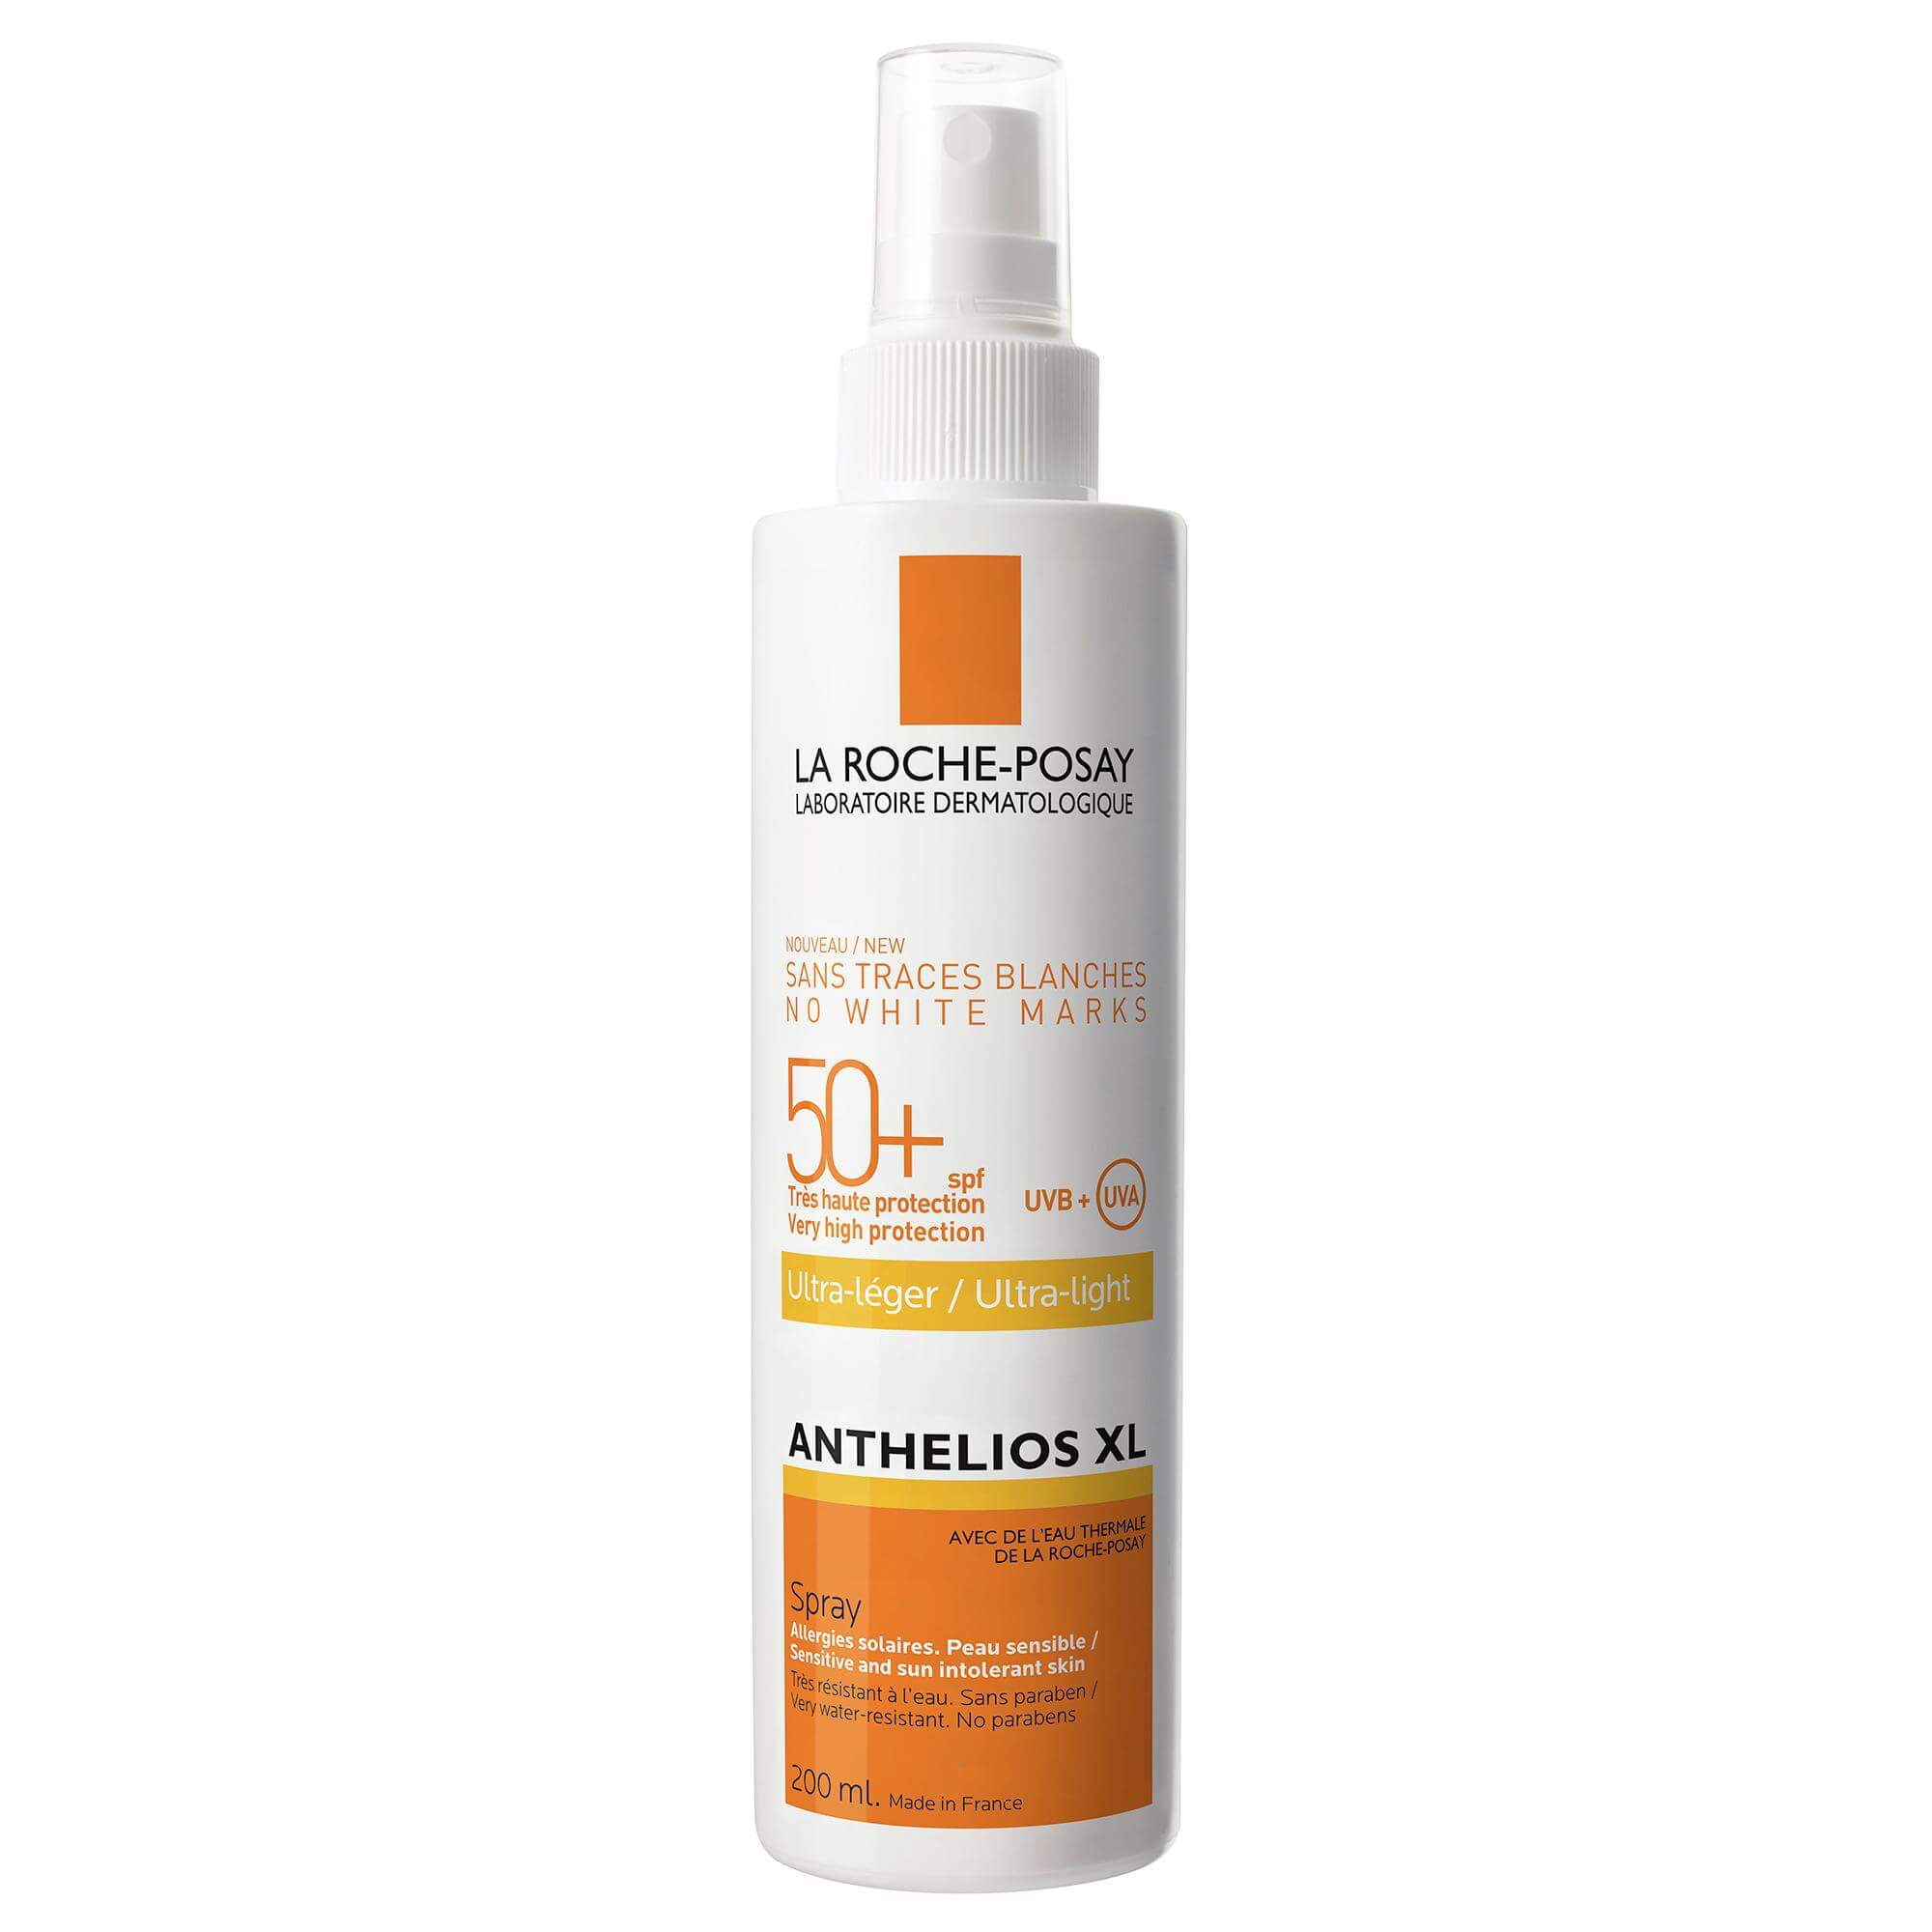 La Roche-Posay Anthelios XL Ultra-Light Spray Spf50+Αντηλιακό SprayΣώματος 200ml